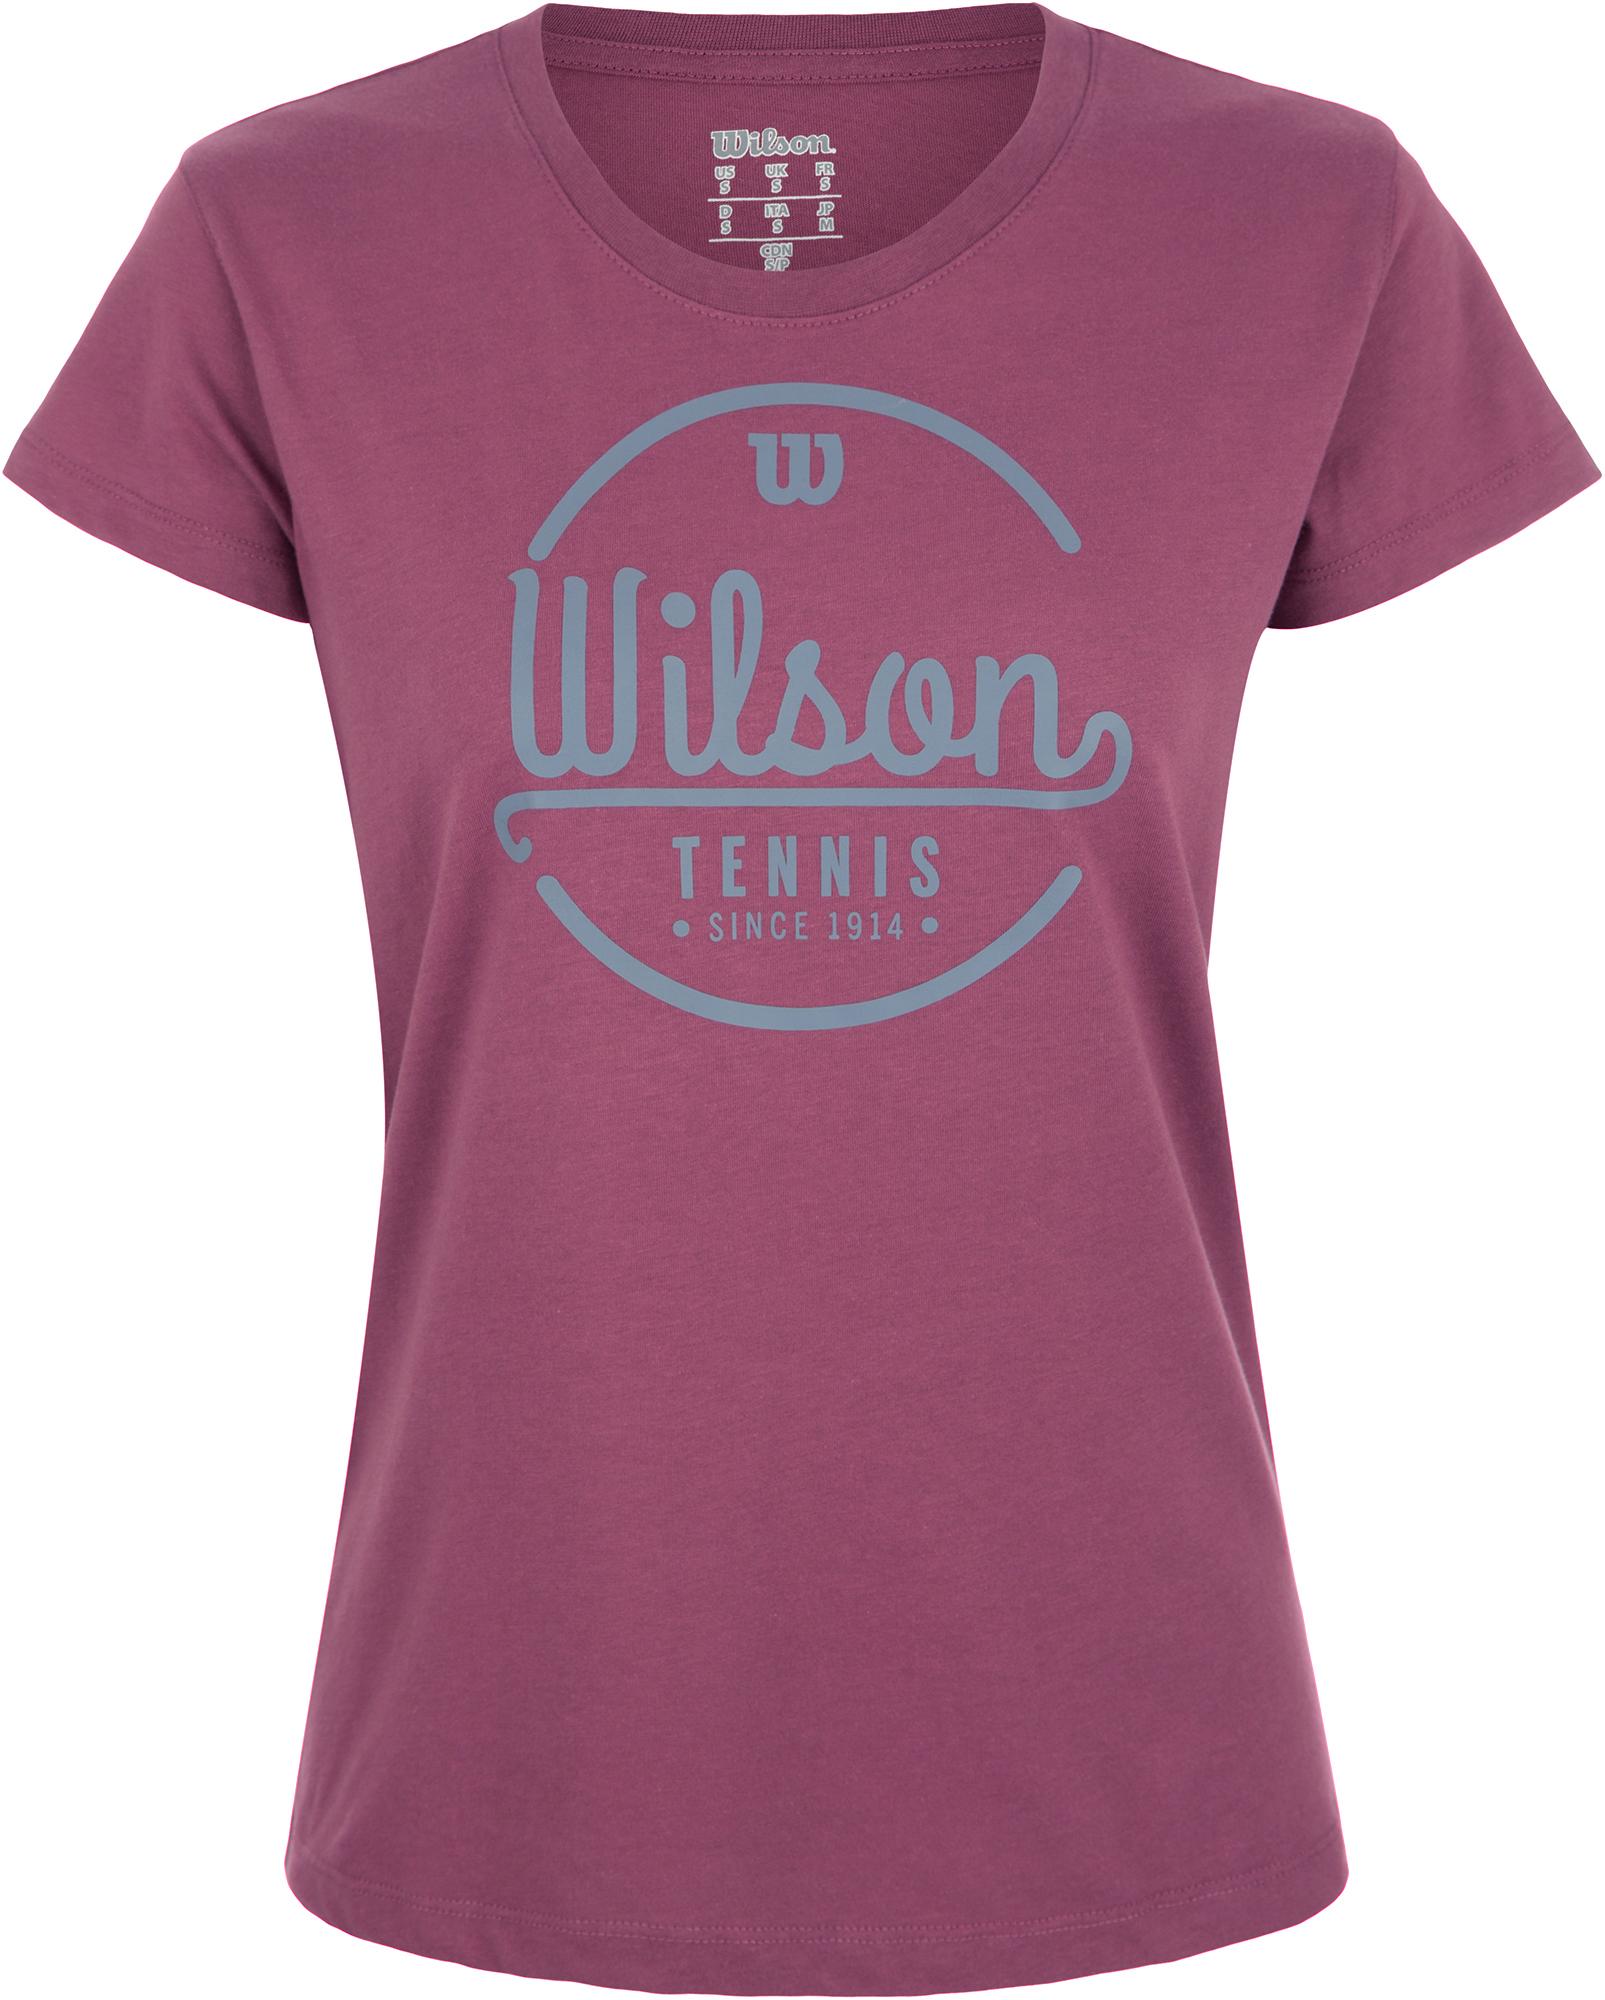 Wilson Футболка женская Lineage Tech Tee, размер 48-50